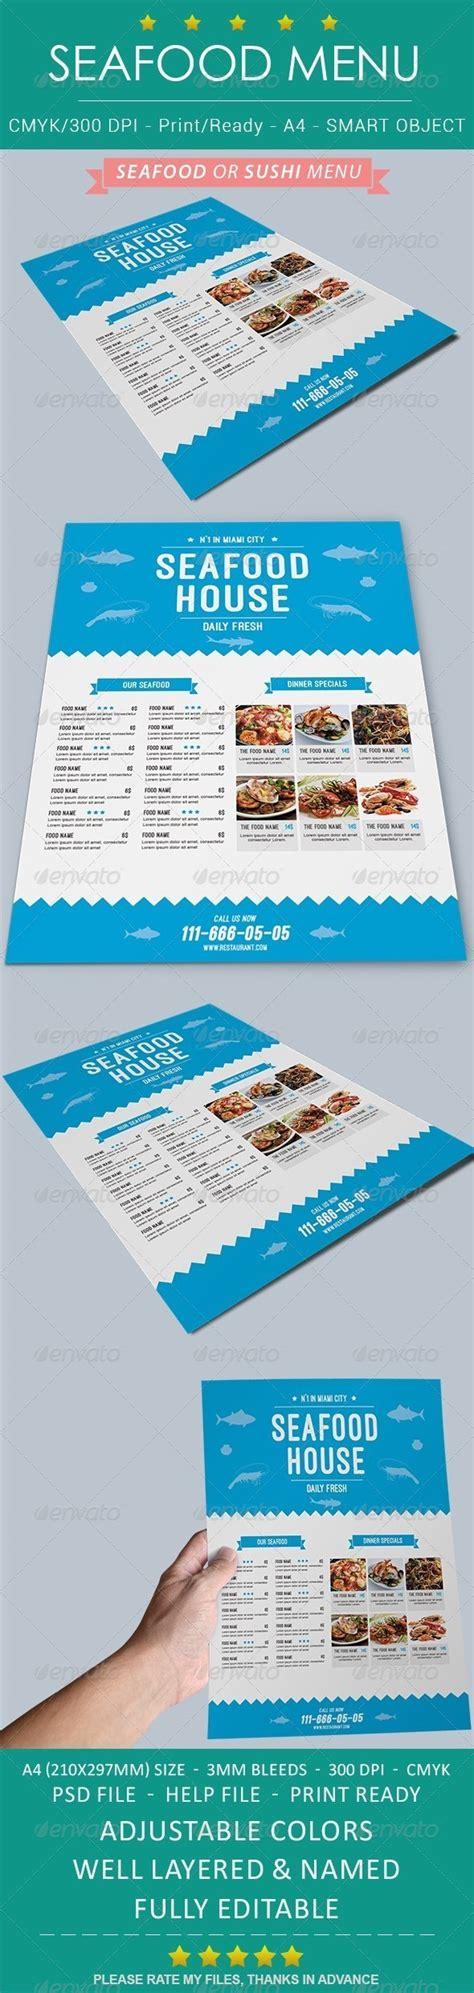 Seafood Sushi Restaurant Menu By Unionmedia Graphicriver Seafood Menu Template